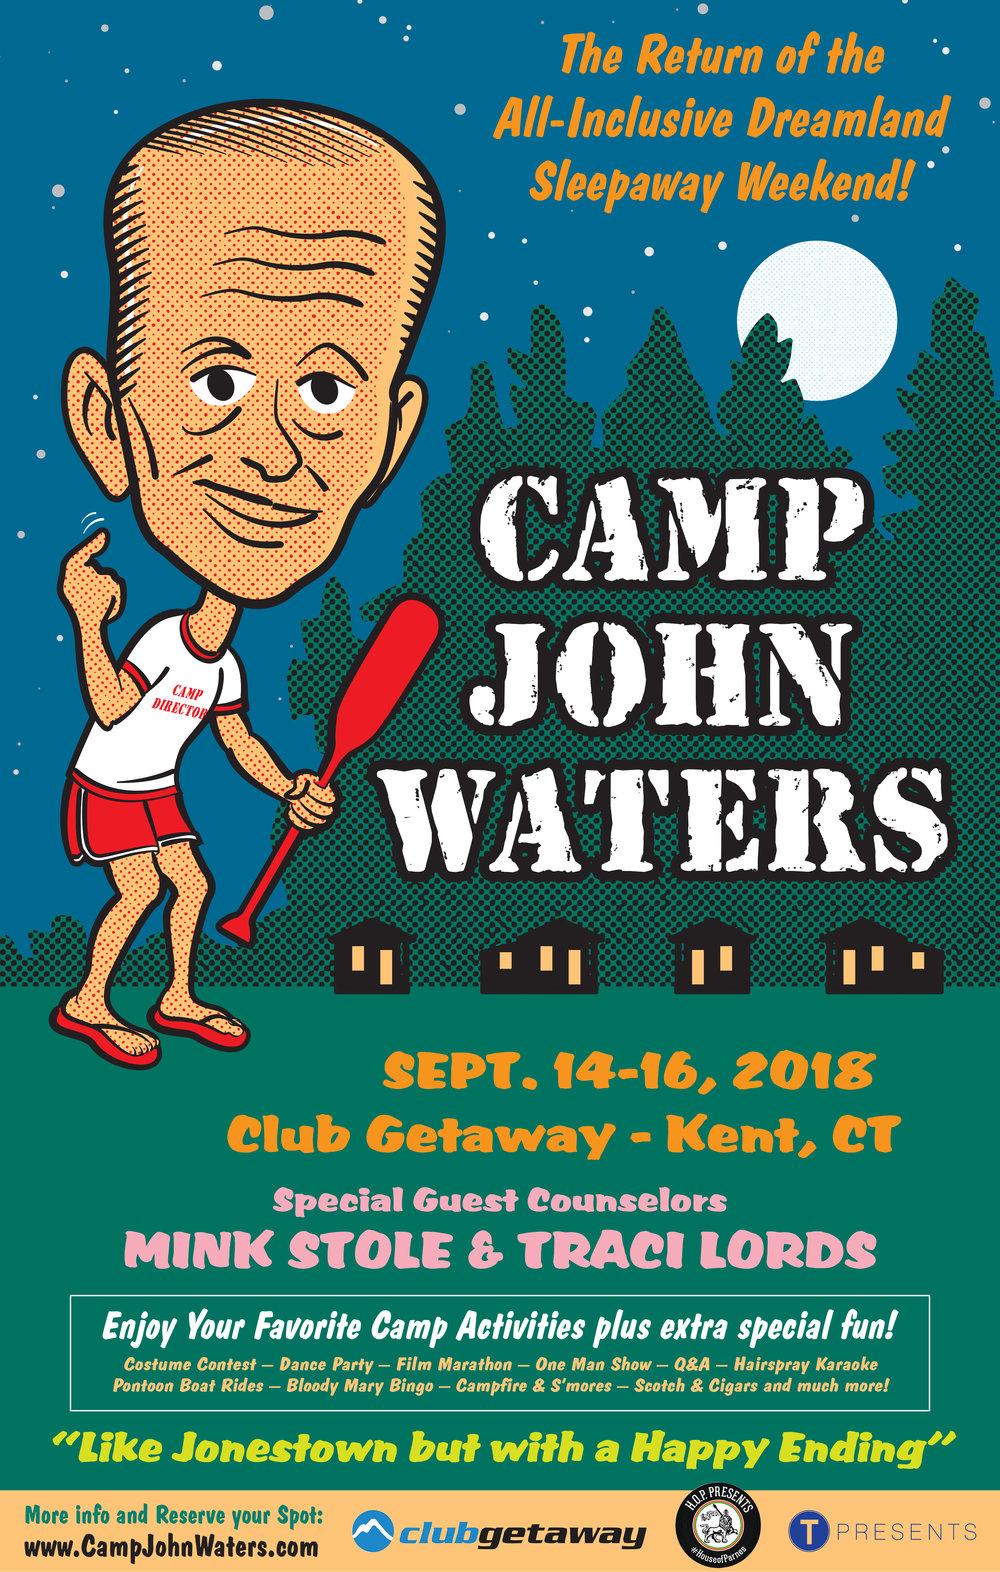 CampJohnWaters2018_11x17c.jpg